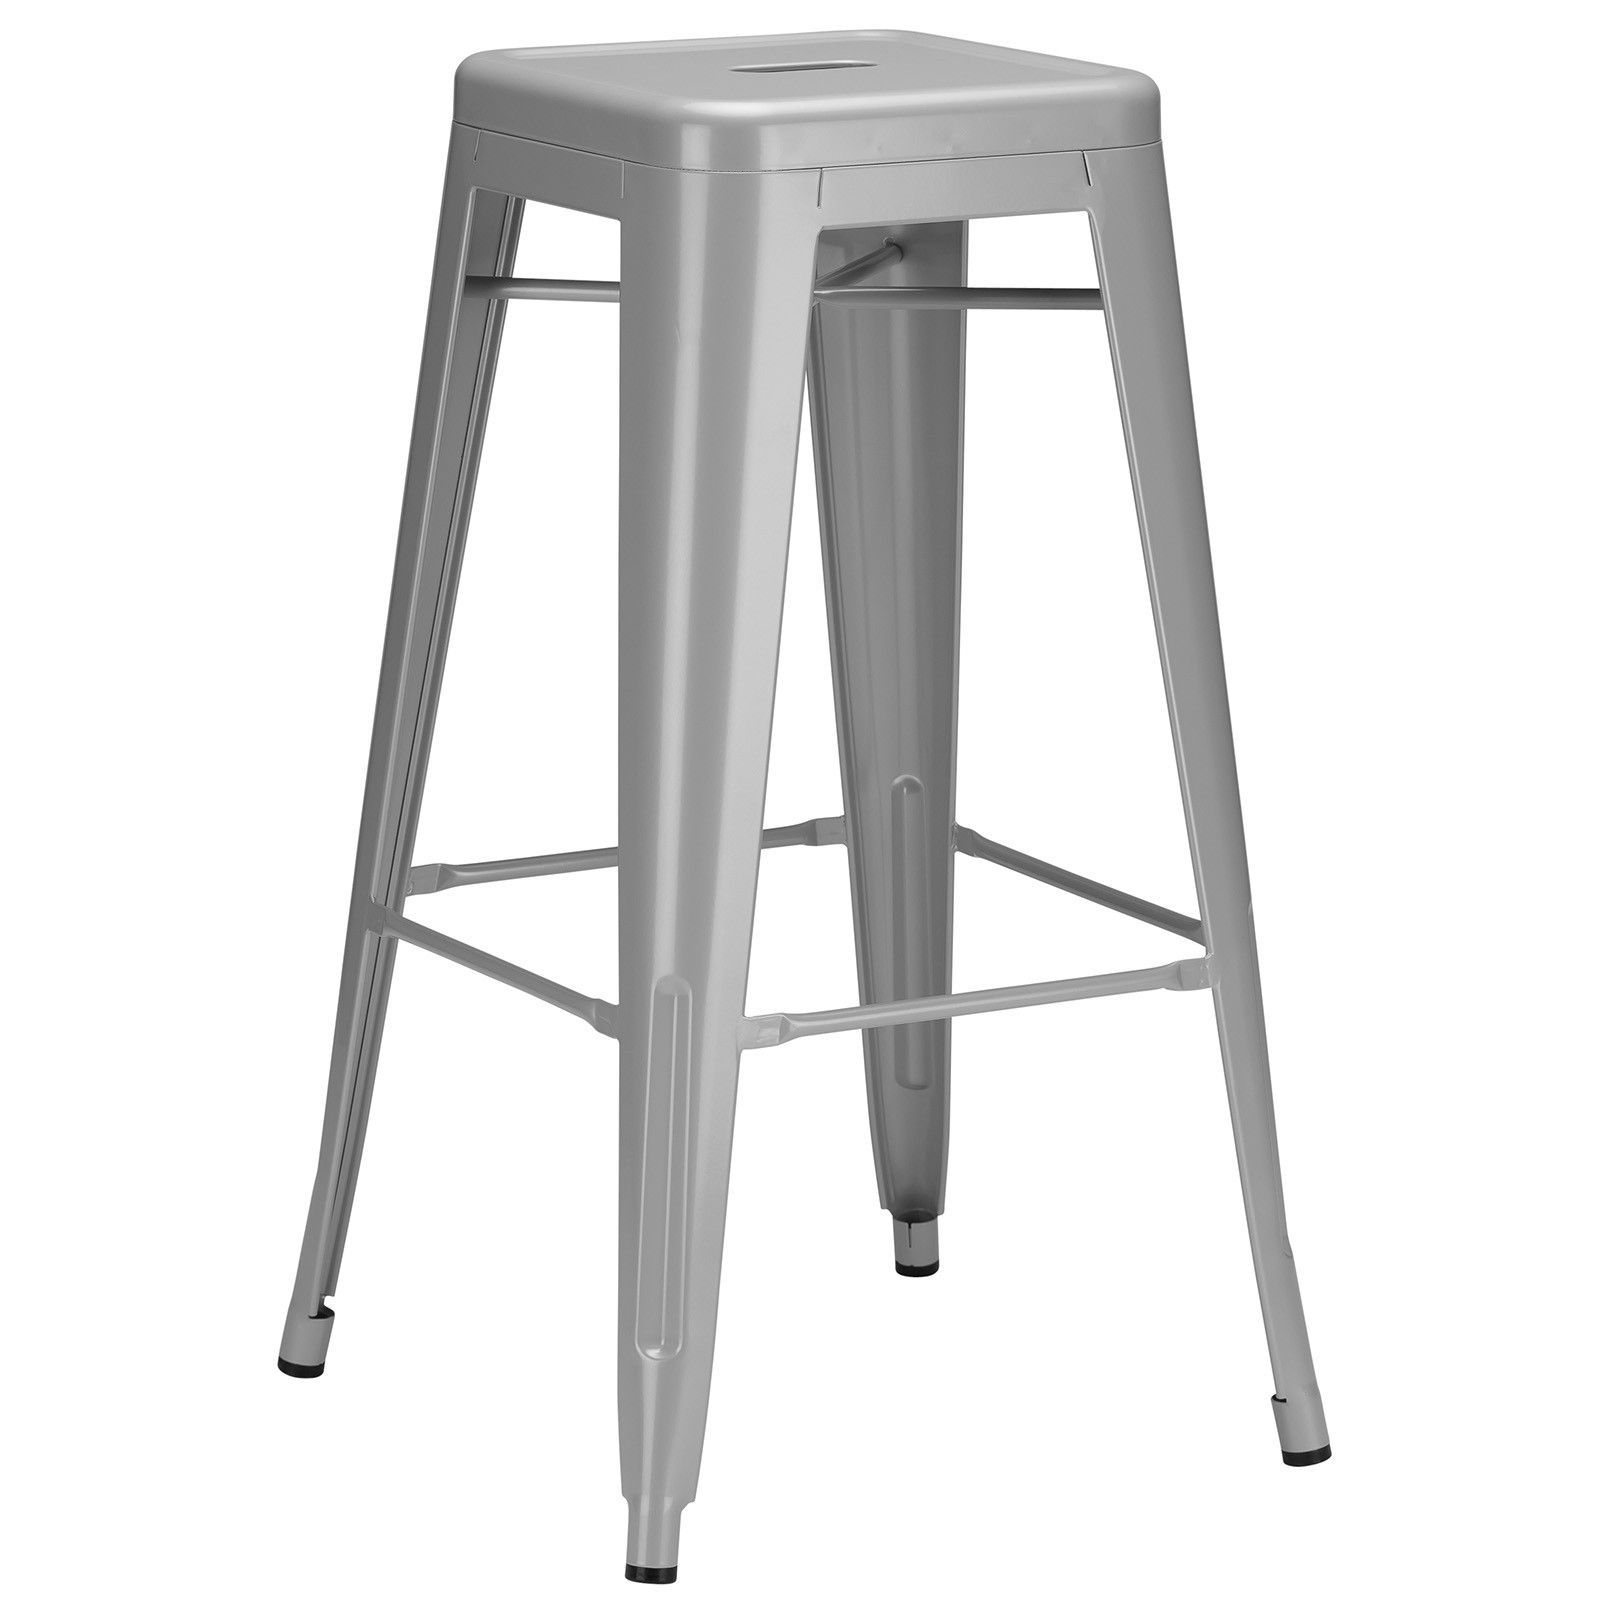 Lanna Furniture Trattoria Bar Stool | Bar stool, Stools and Products